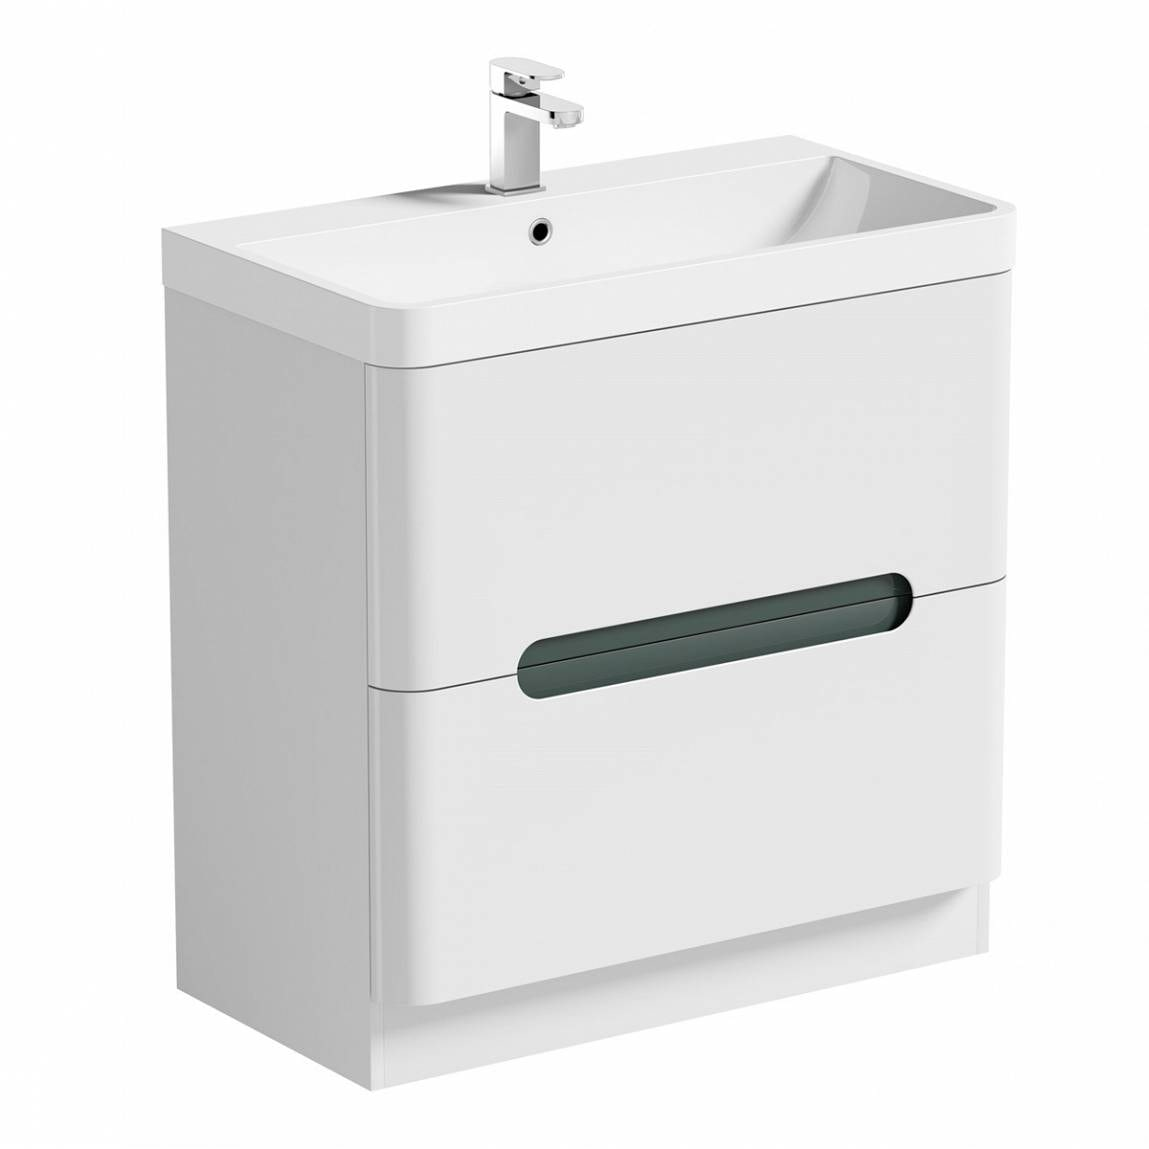 ModeEllis select slatevanity drawer unit and basin 800mm